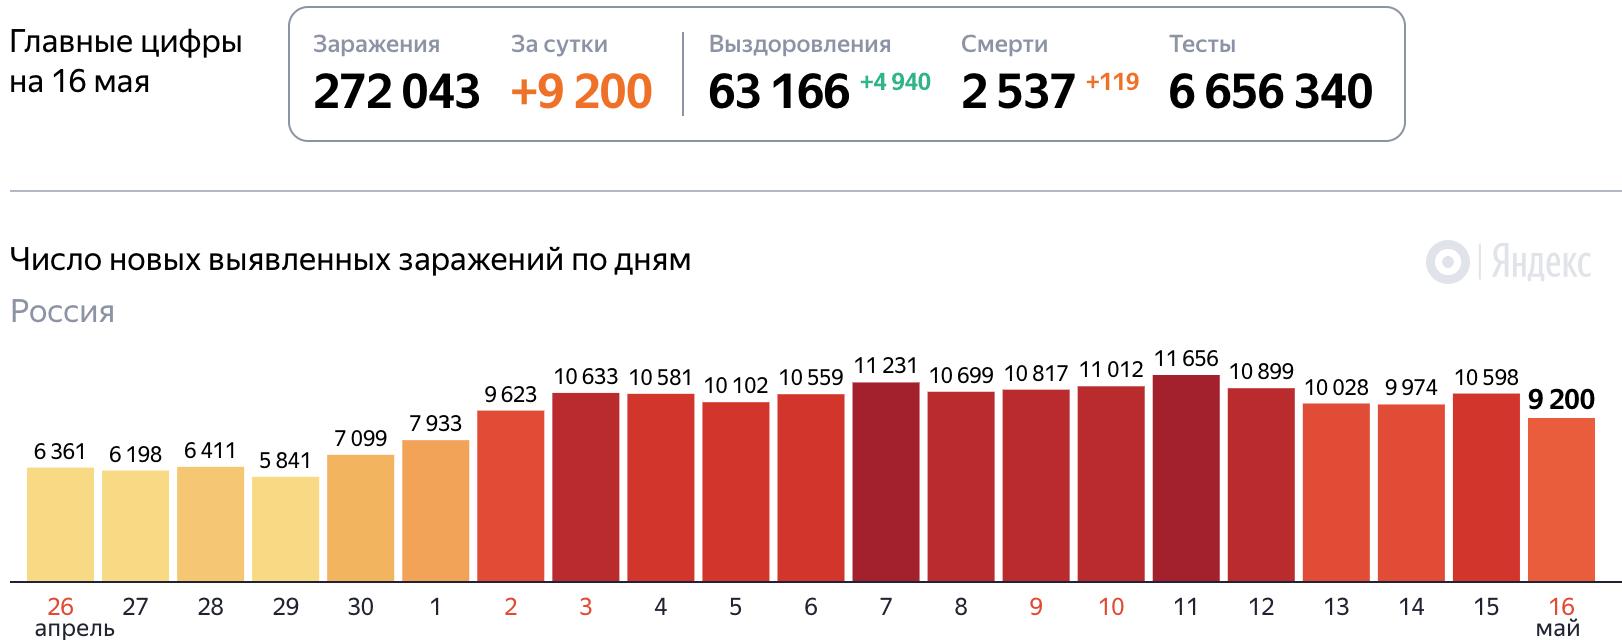 Коронавирус на 16 мая 2020 года статистика в России